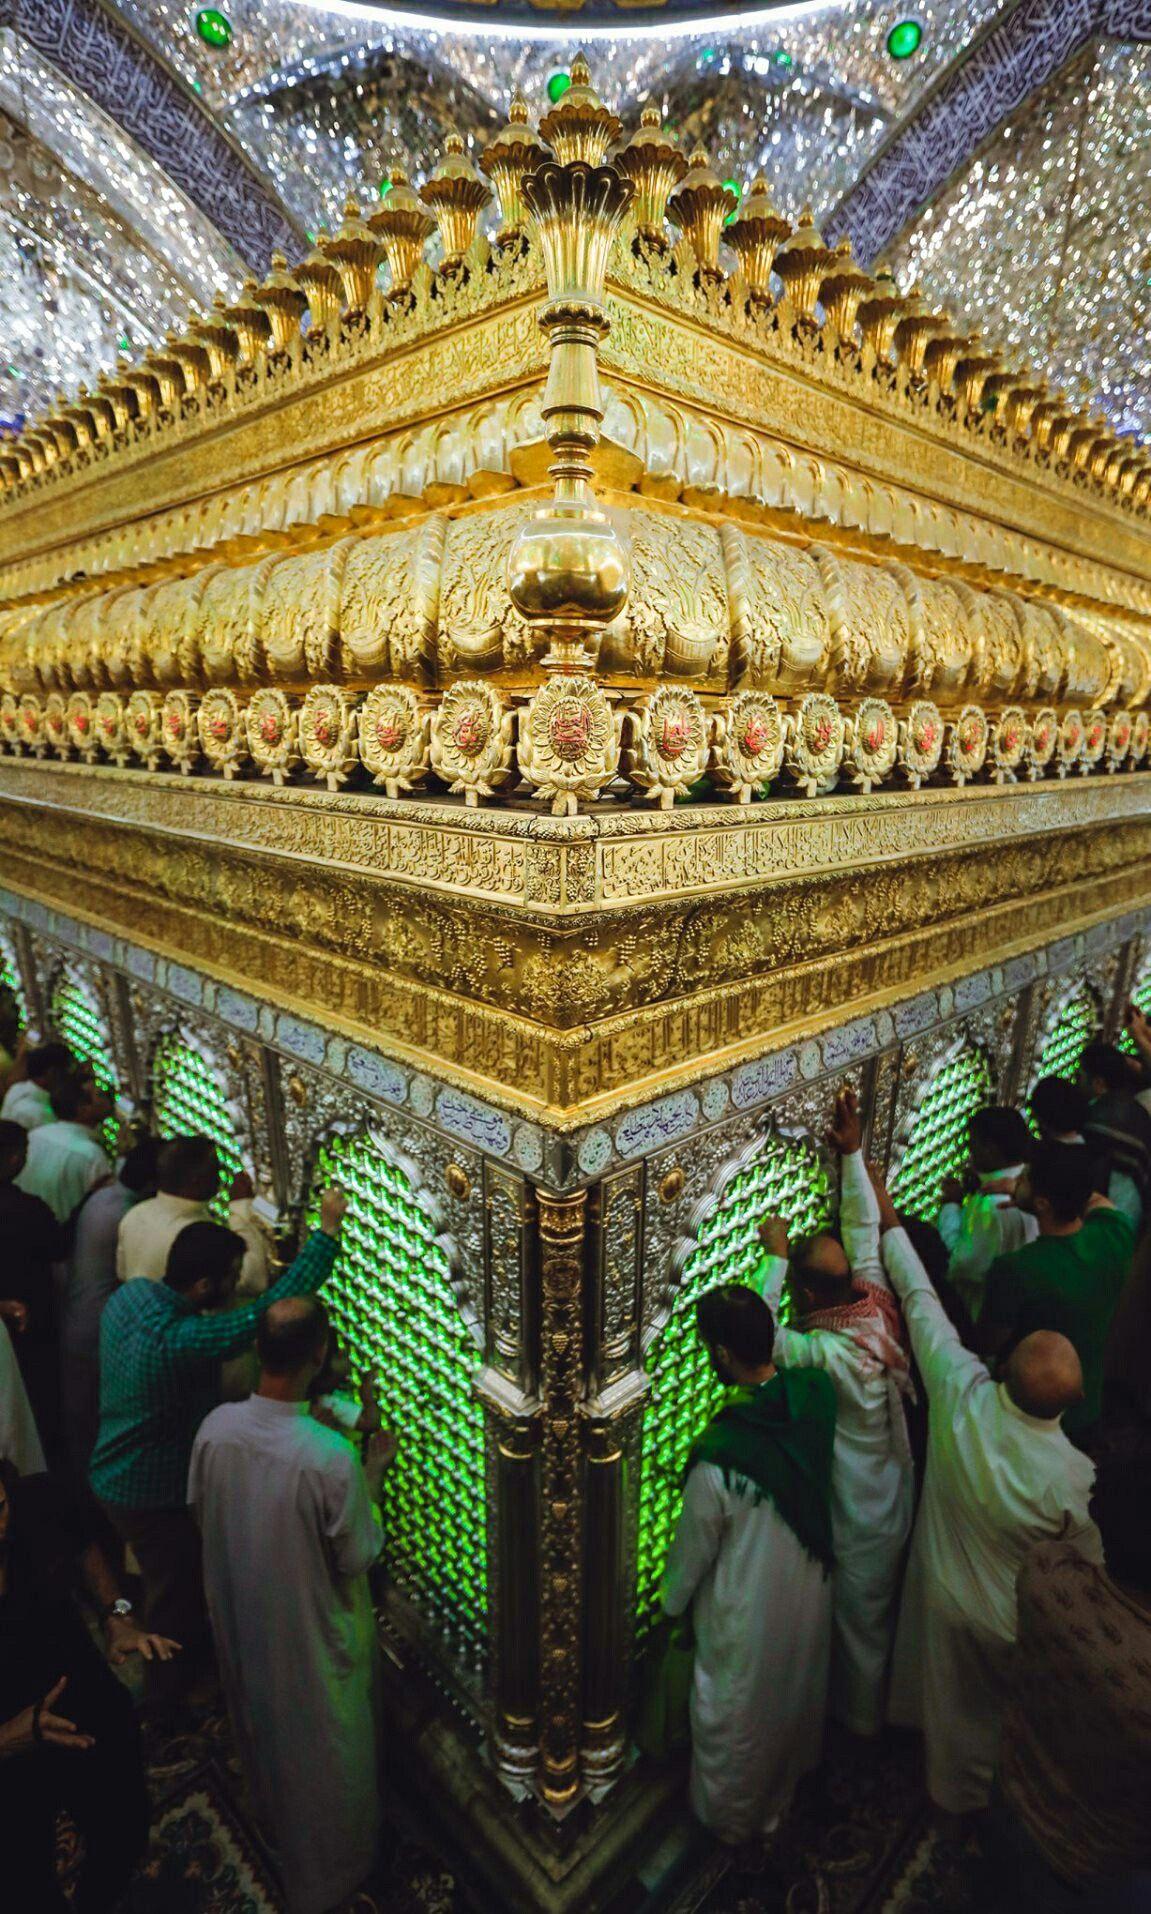 Yaali Imamali Najaf Iraq Holyshrine Shiaislam Shiamultimediateam Smt Shiamultimedia Imam Ali Eiffel Tower Inside Shrine